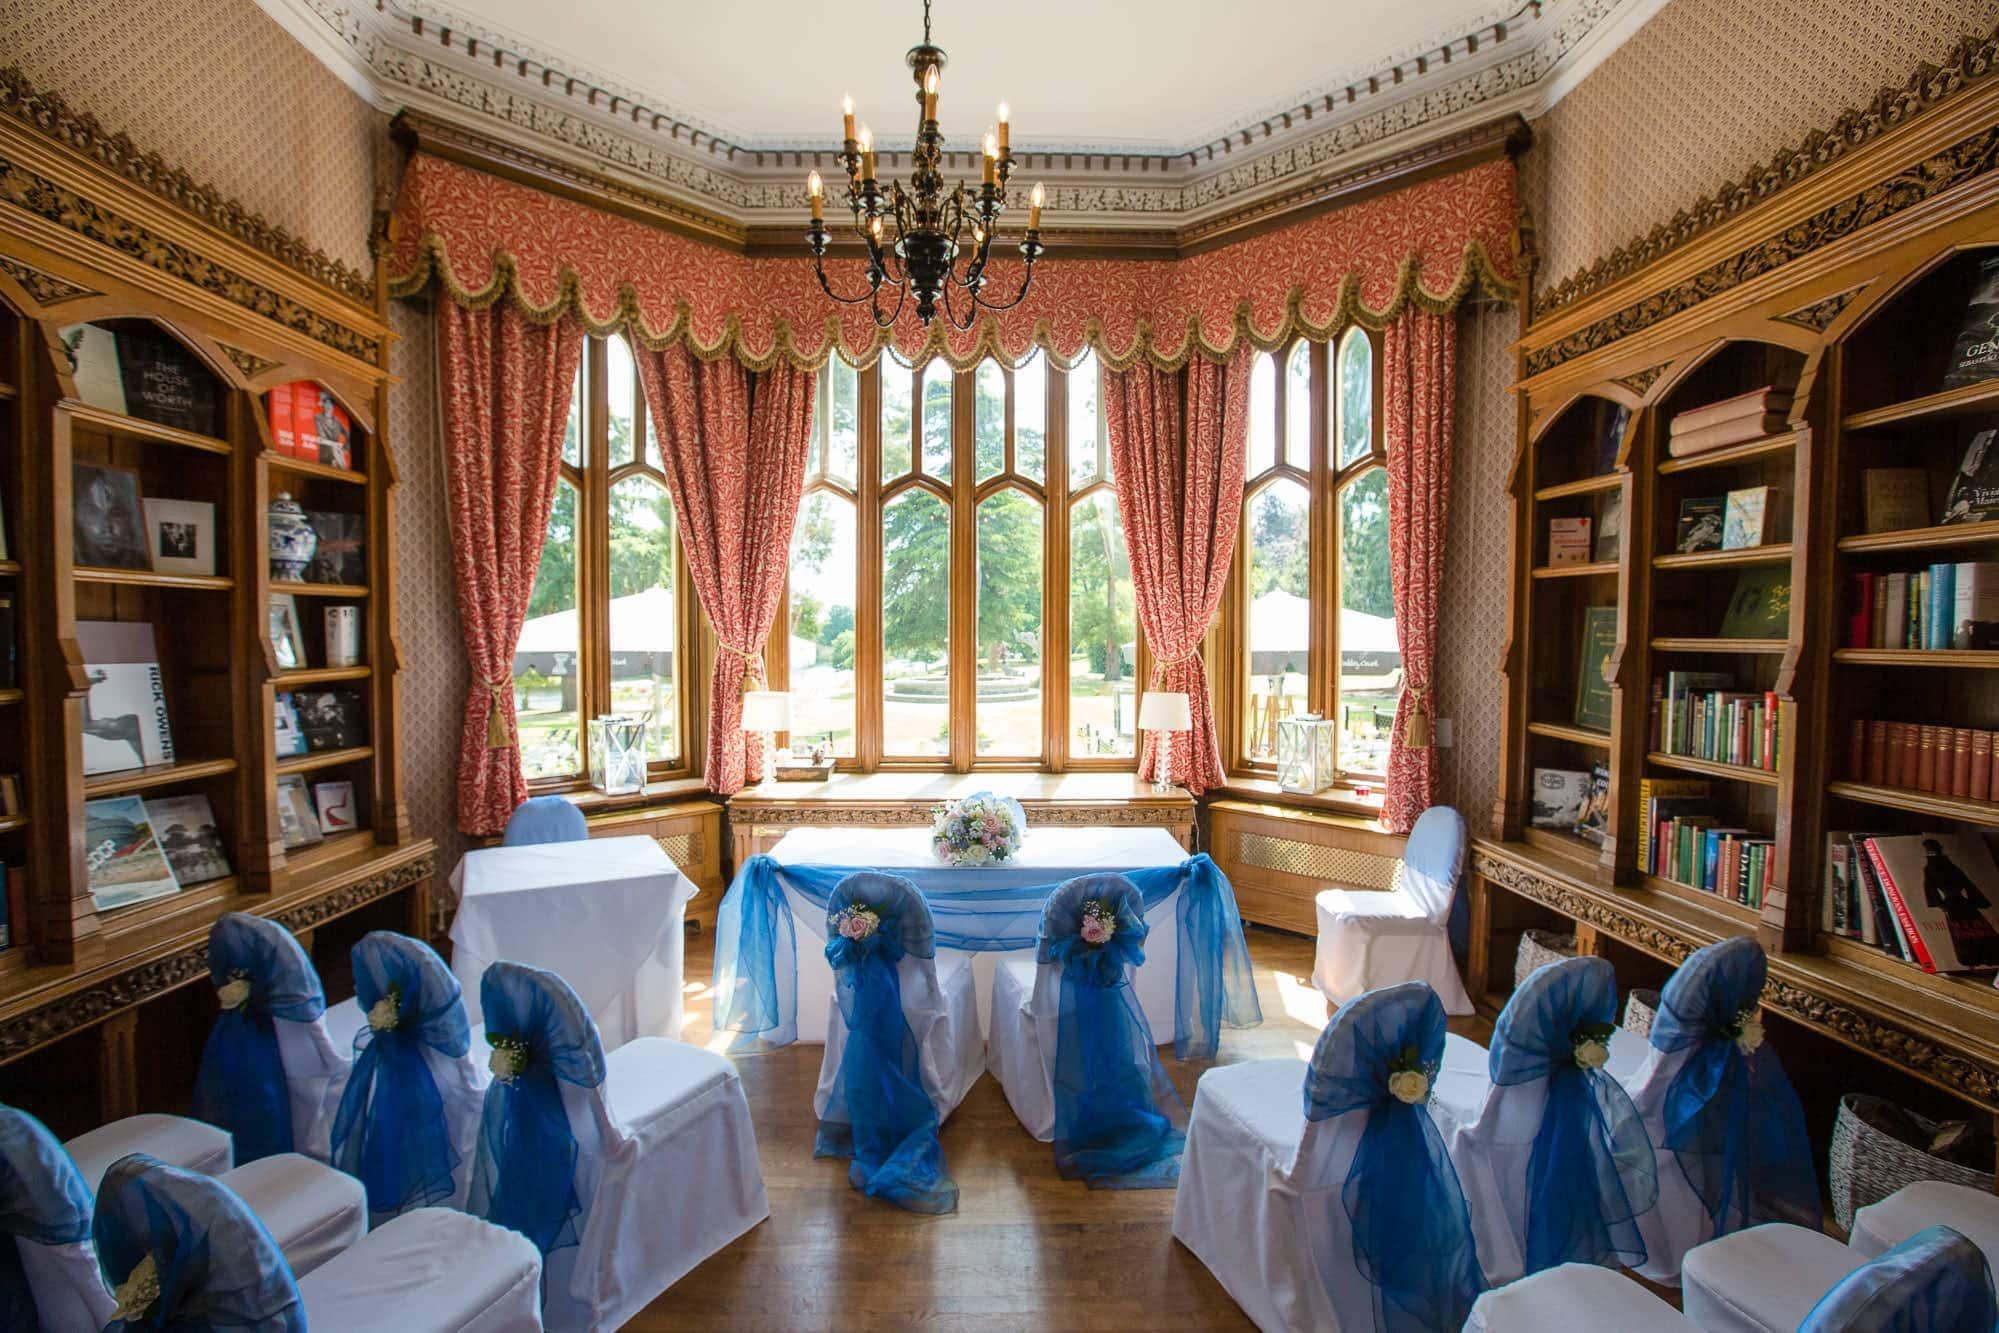 Oakley Court Hotel small wedding ceremony room